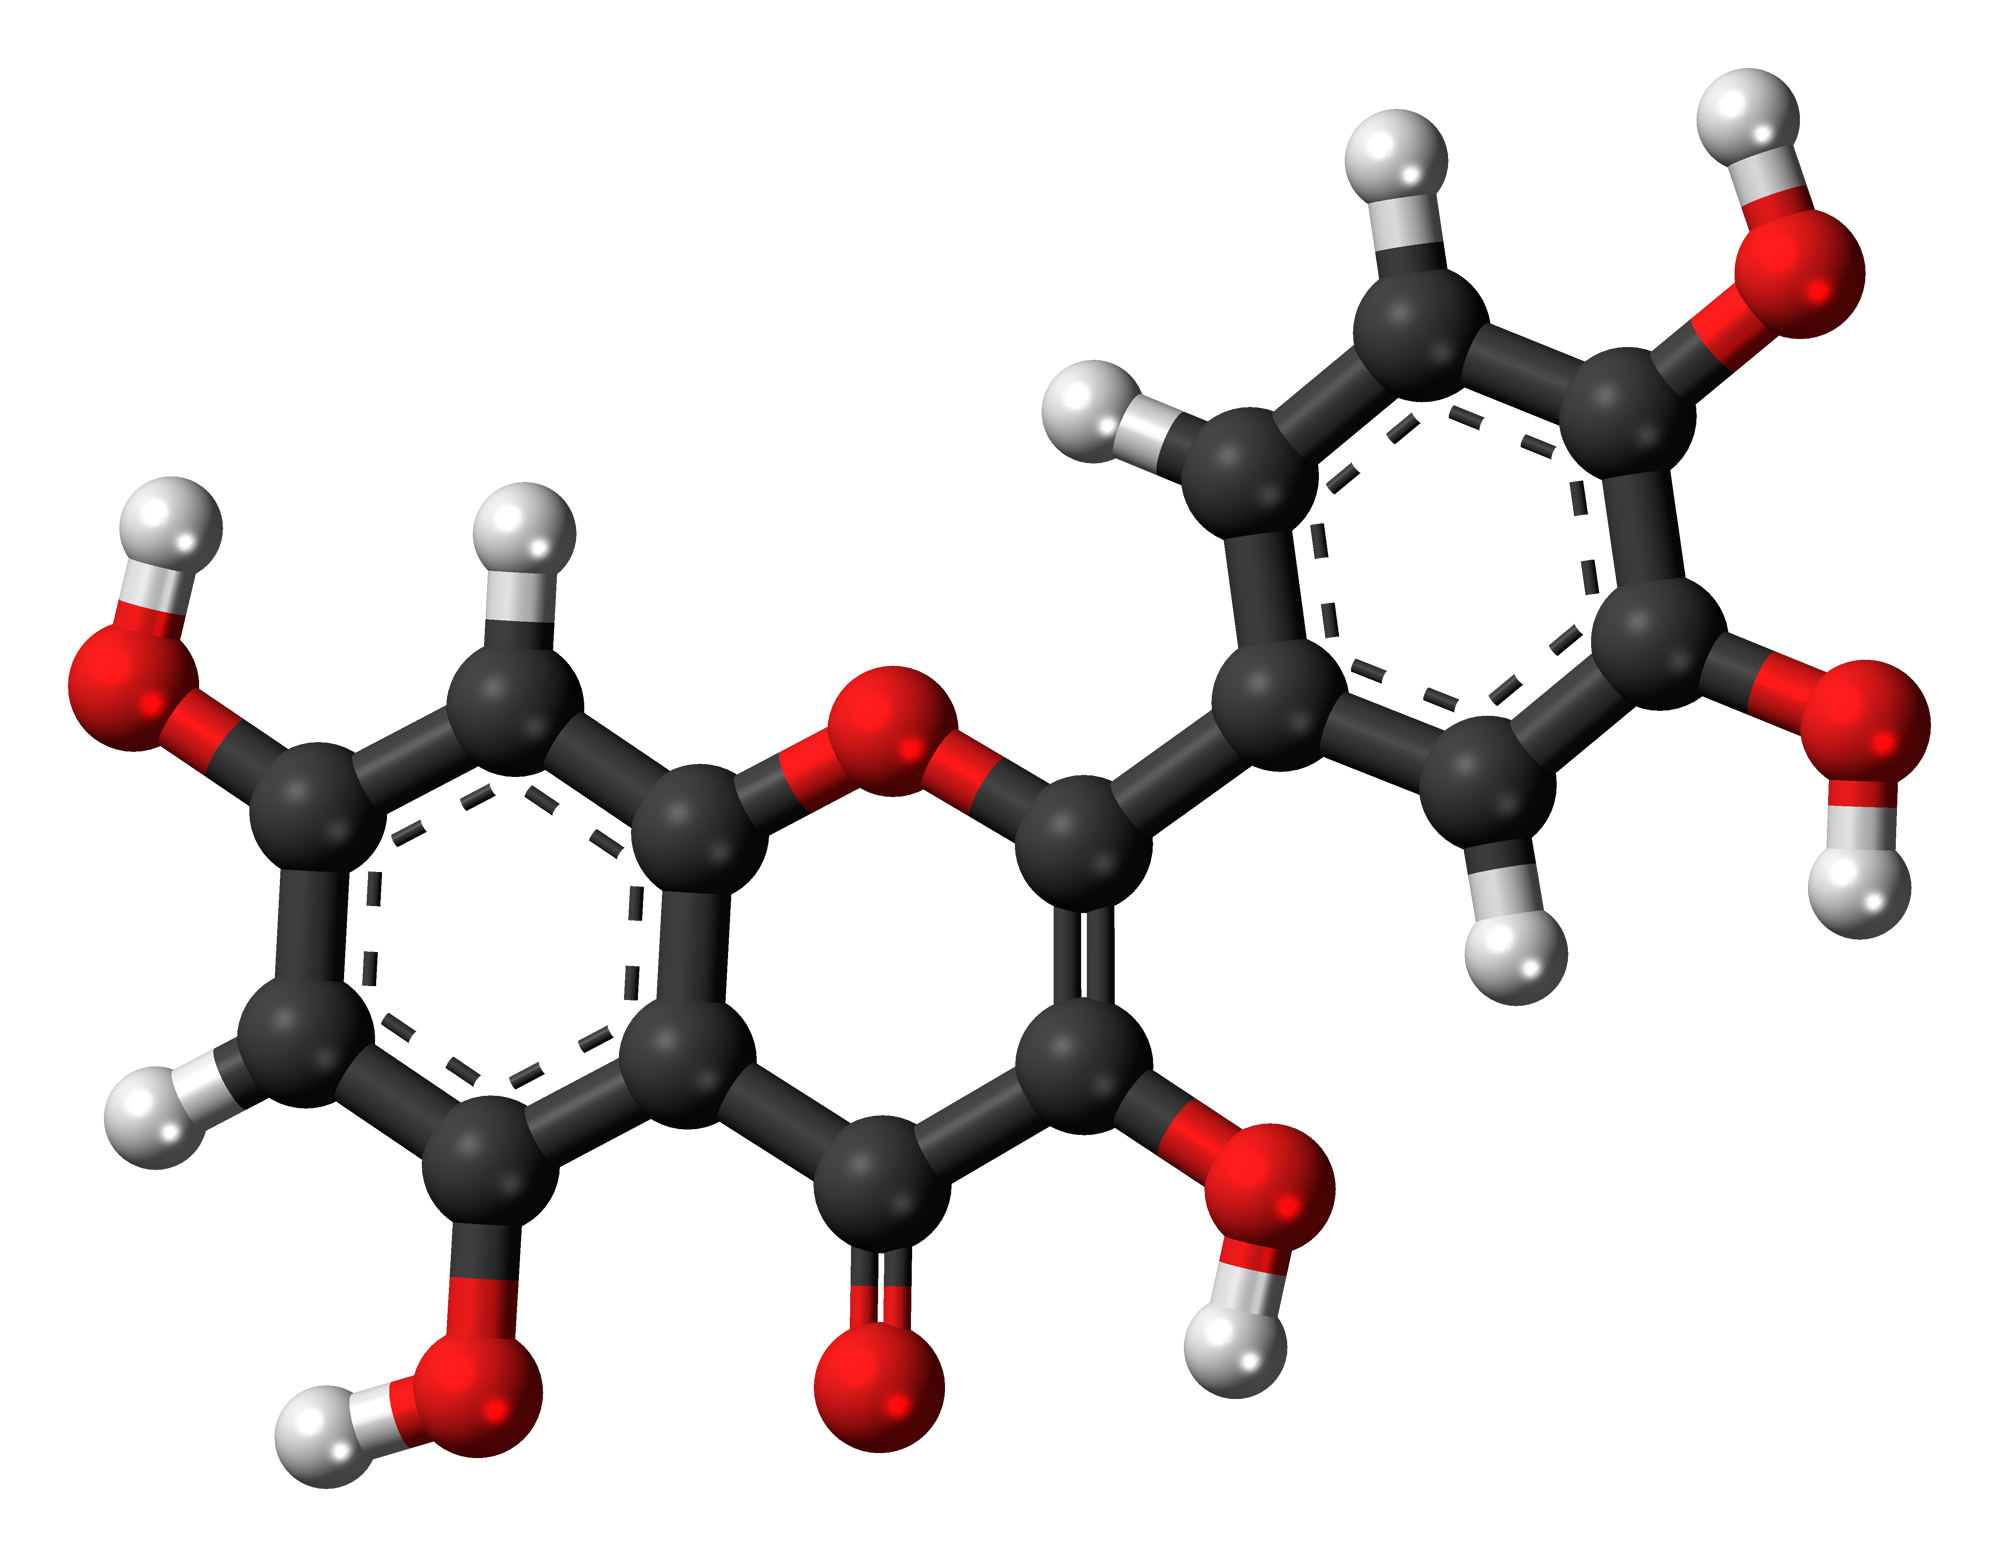 Molecular structure of quercetin